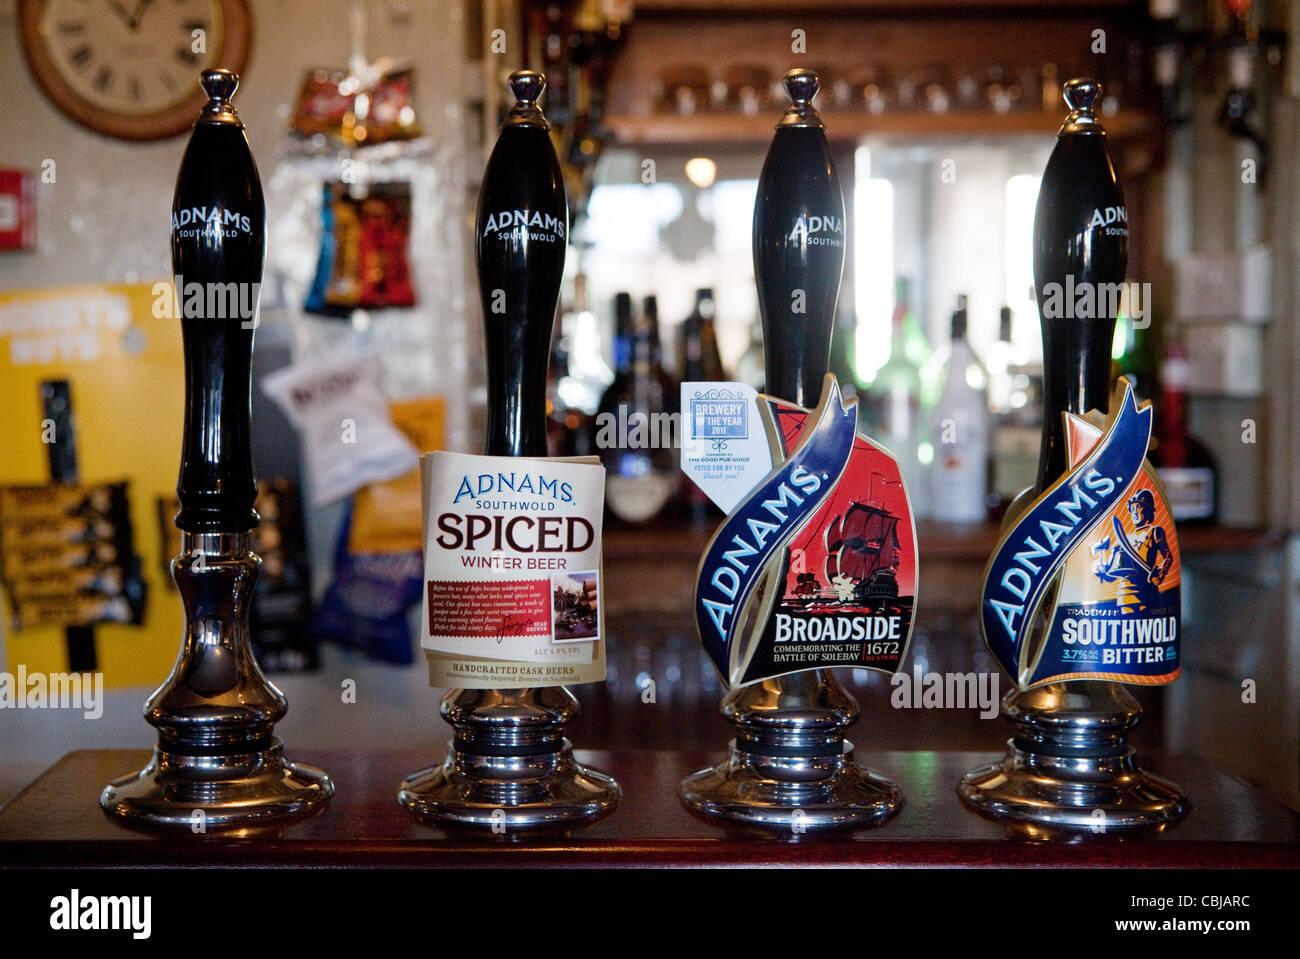 Adnams beer pump pumps, The Bell inn, Middleton, Suffolk UK - Stock Image